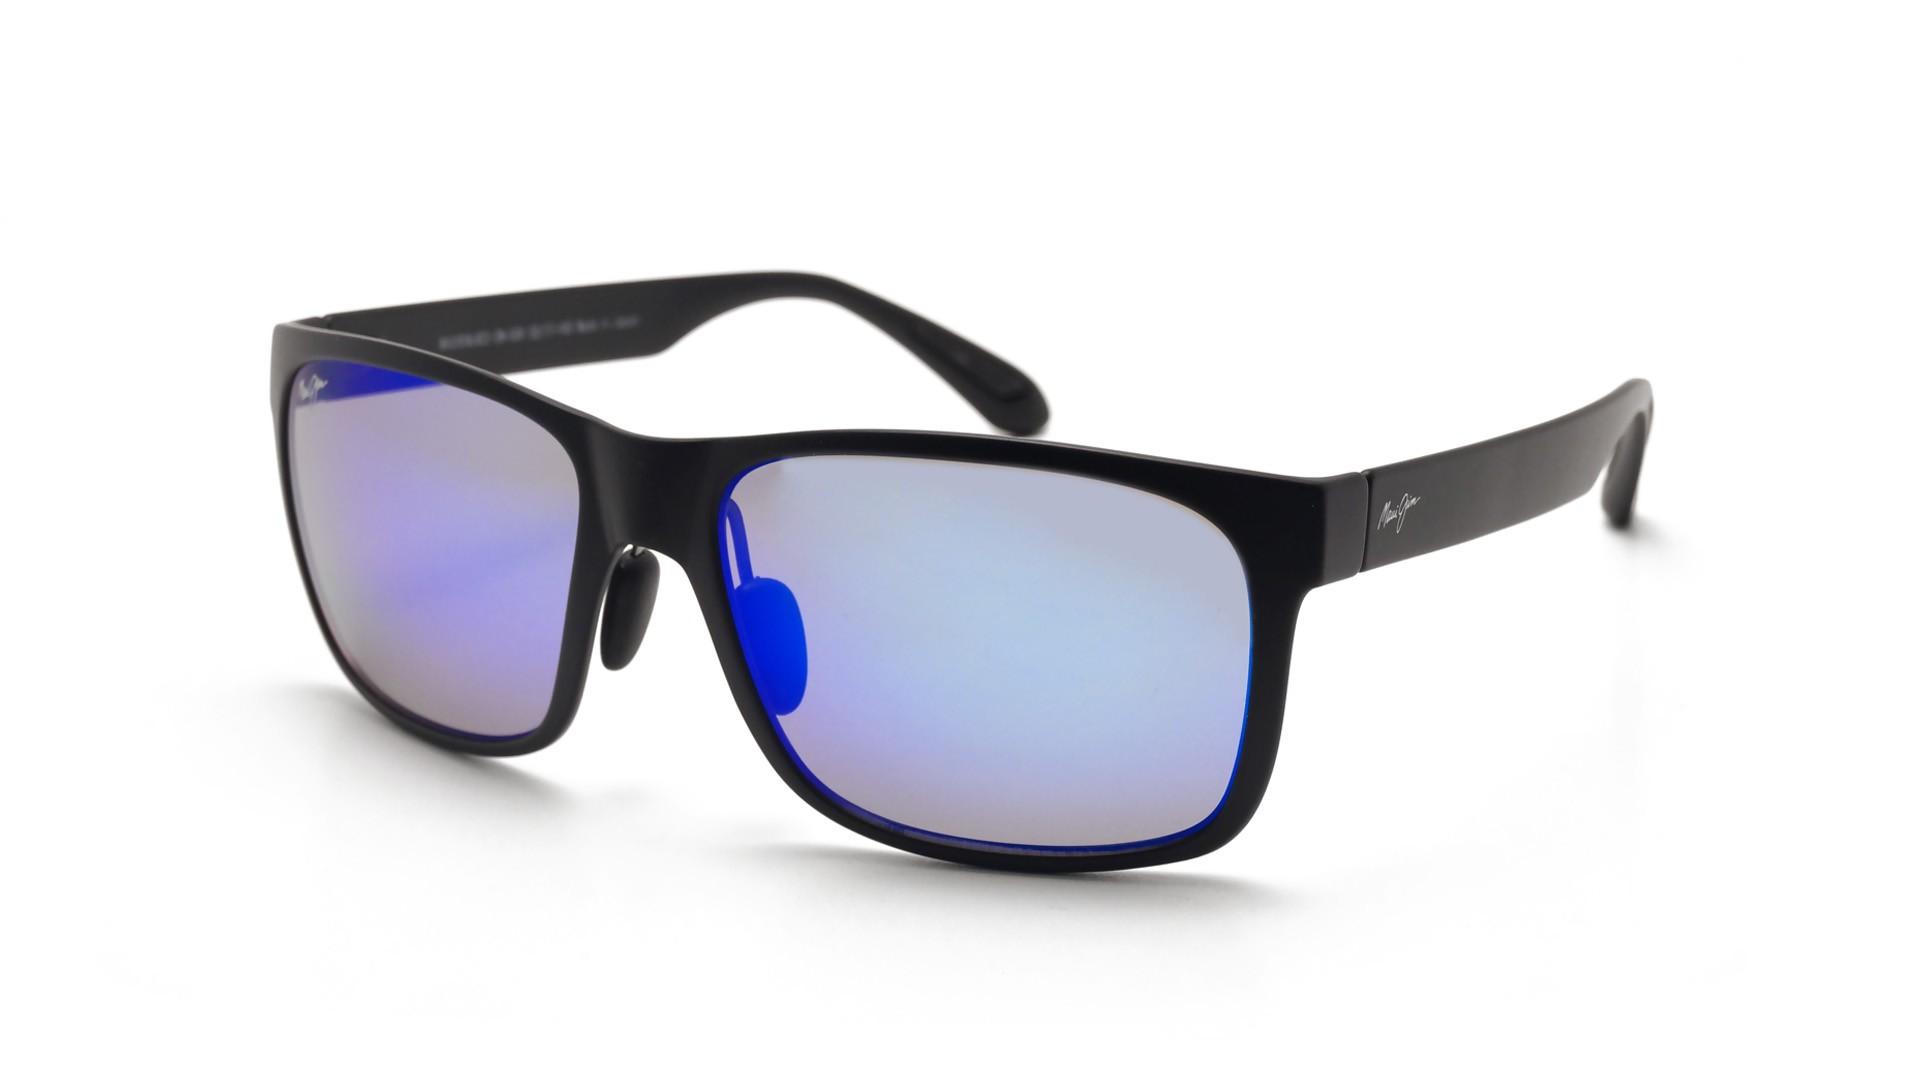 70913927de Sunglasses Maui Jim Red Sands Black Mat B432 2M 59-17 Large Polarized Flash